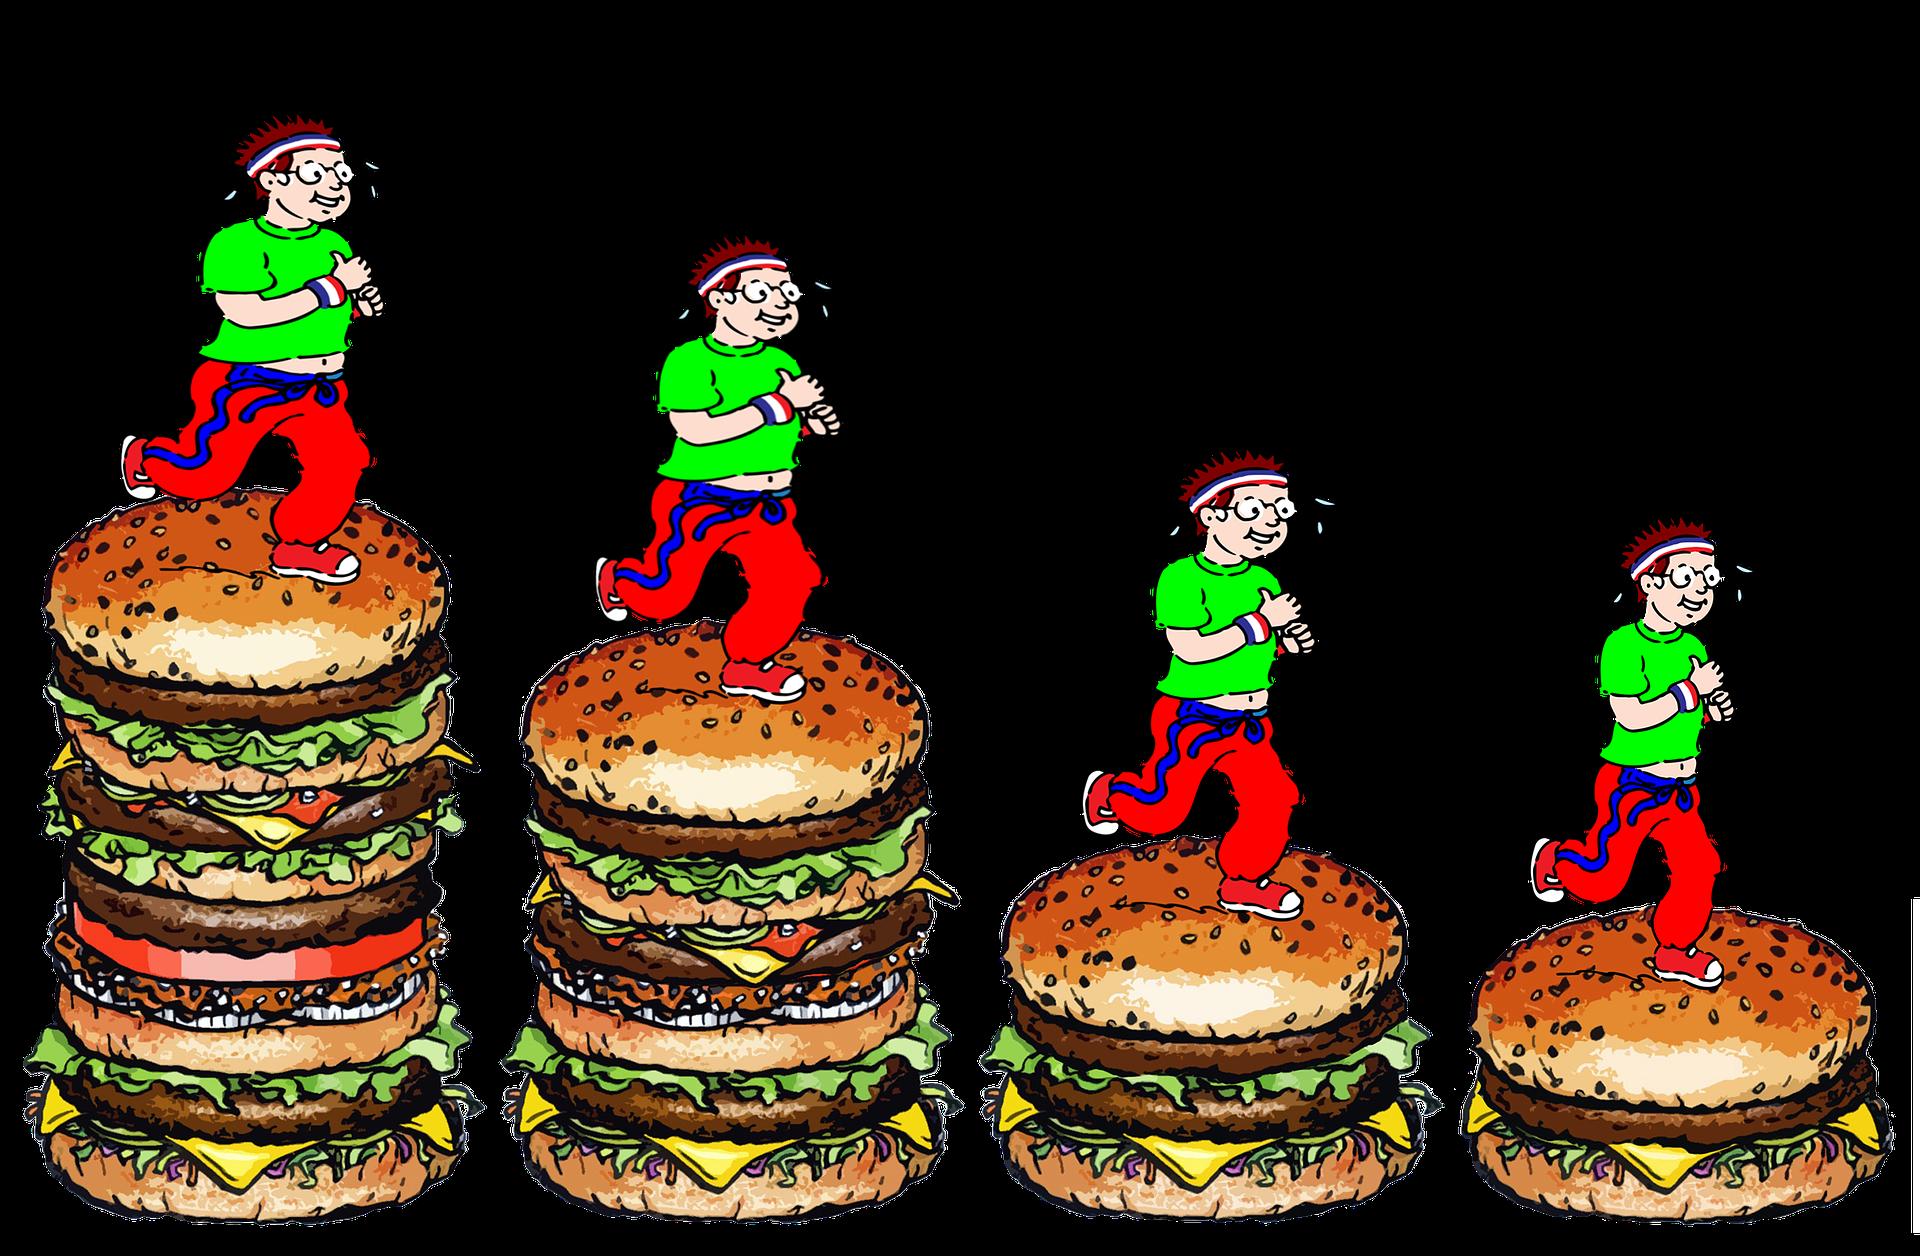 Perdre-les-calories-de-la-malbouffe